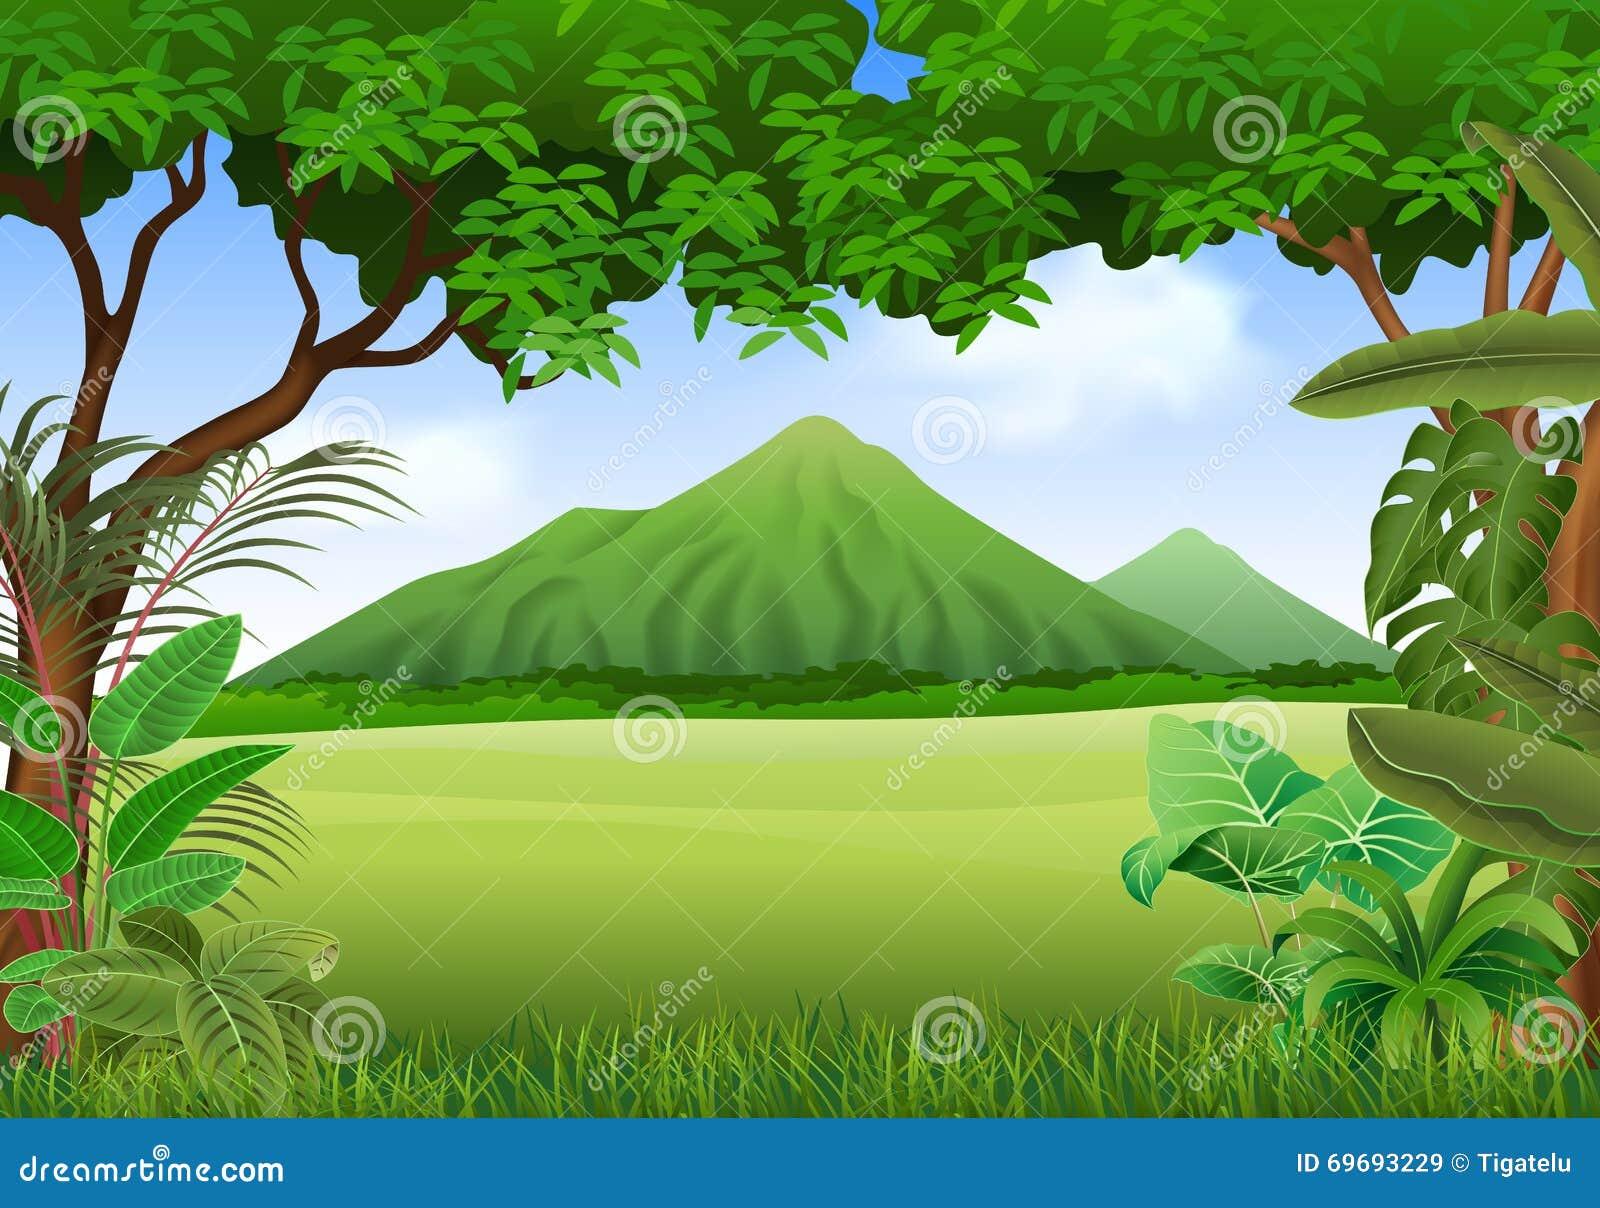 Landscape Illustration Vector Free: Cartoon Illustration Of Beautiful Natural Landscape